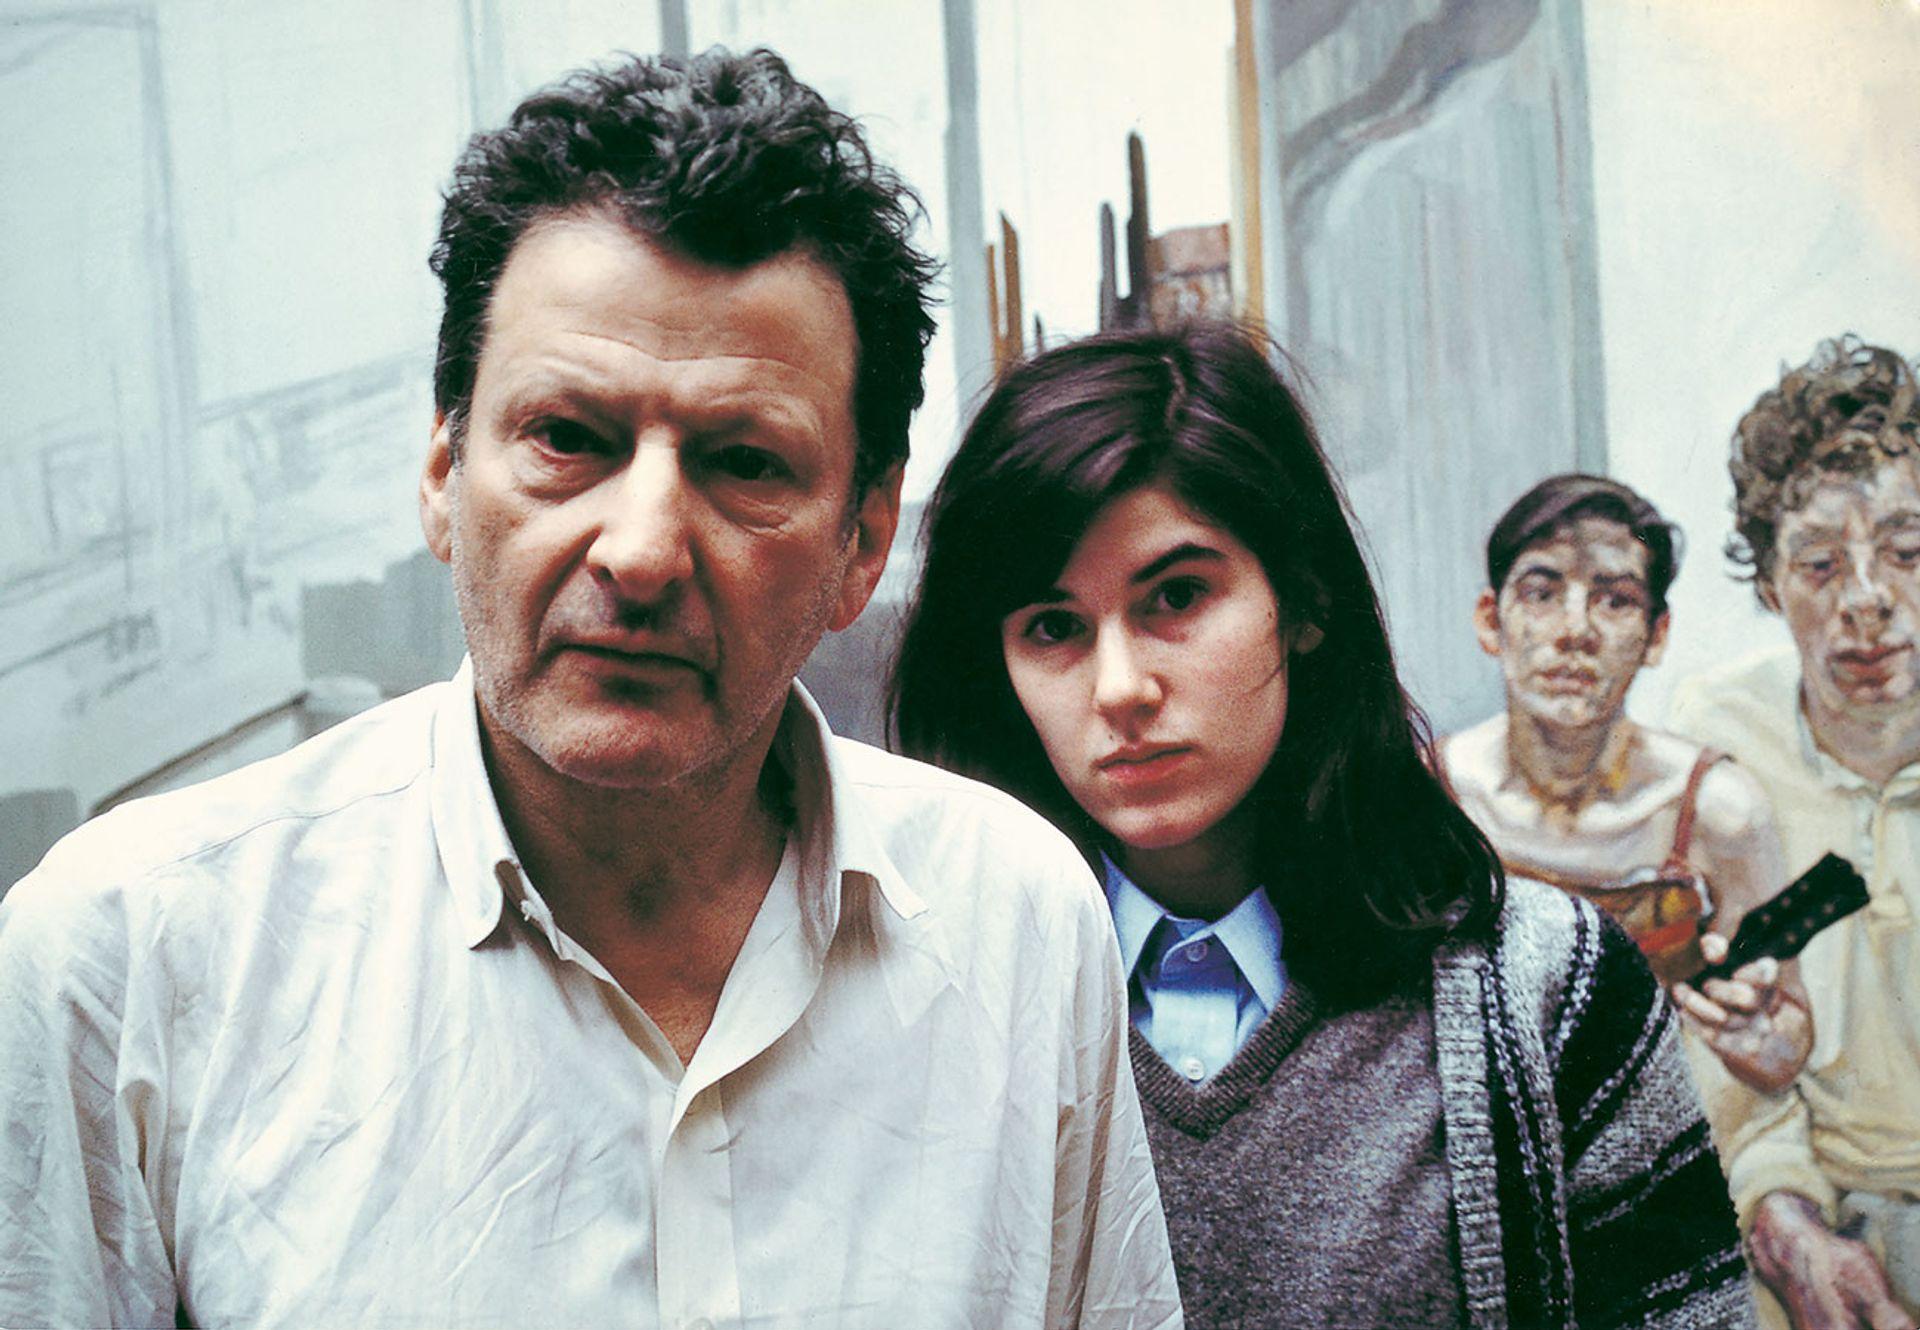 Bruce Bernard's 1983 image of Lucian Freud and his daughter, Bella © Estate of Bruce Bernard